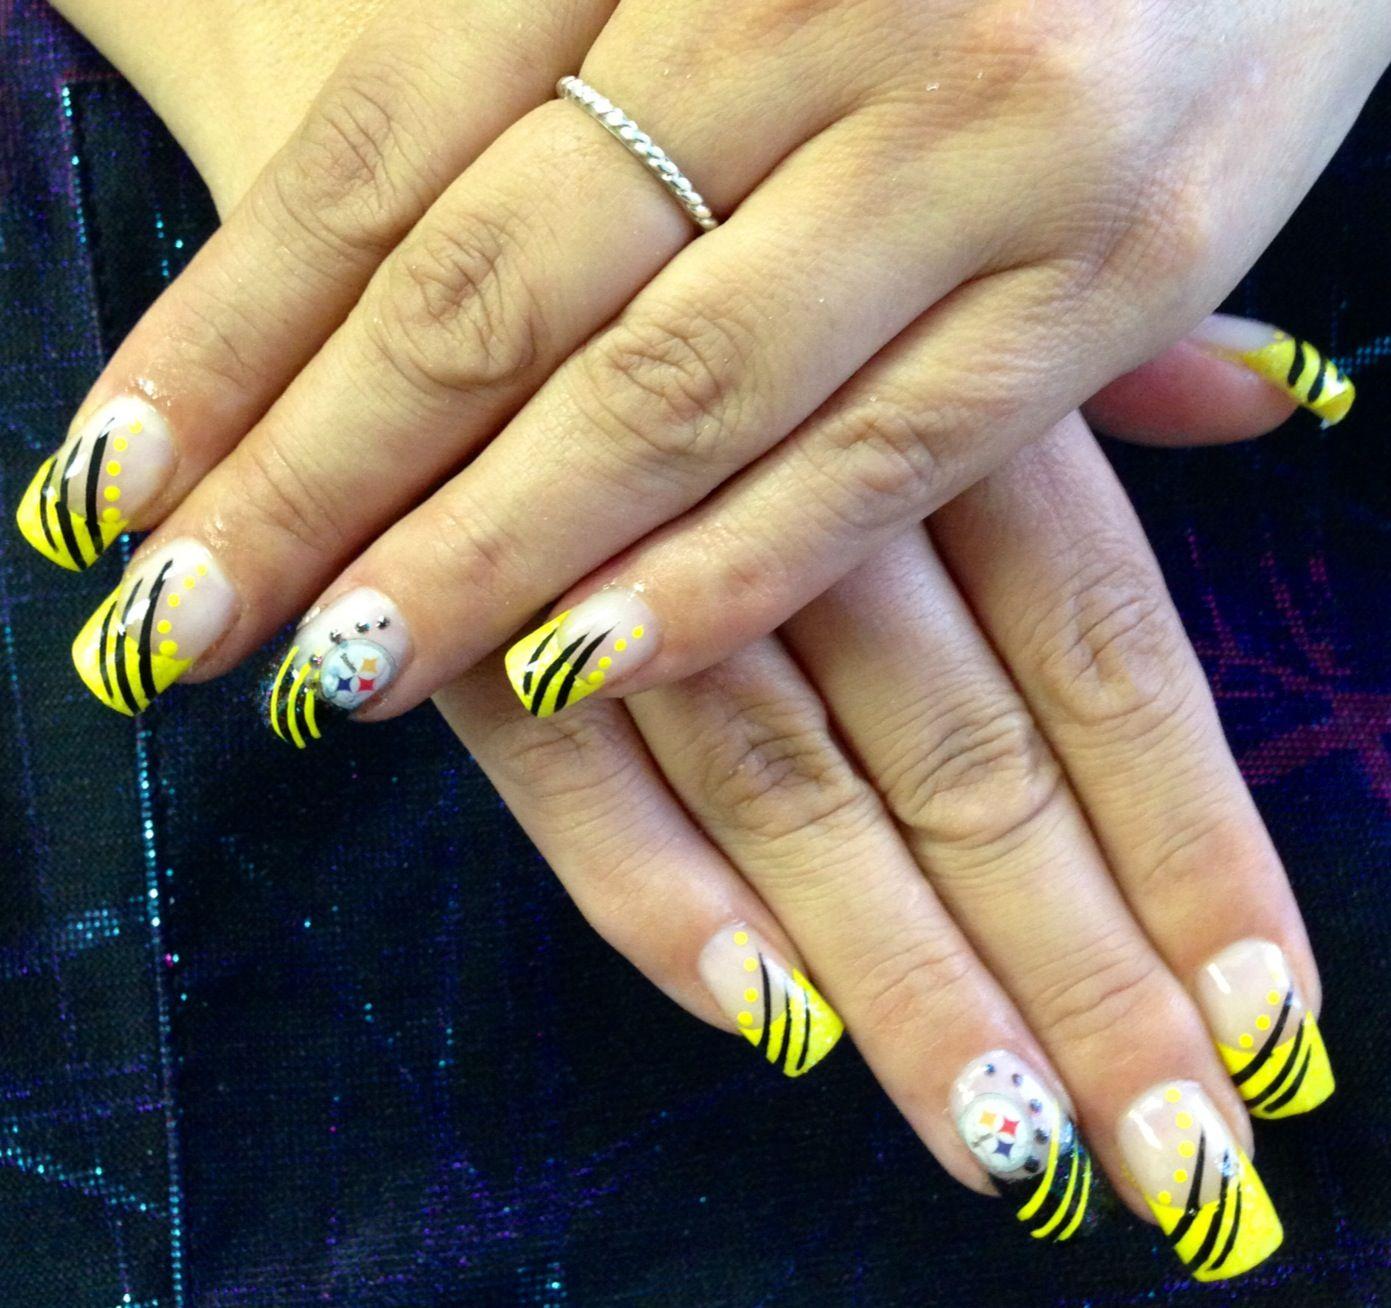 Steelers nails by Alicia Palacios | nails sports ...